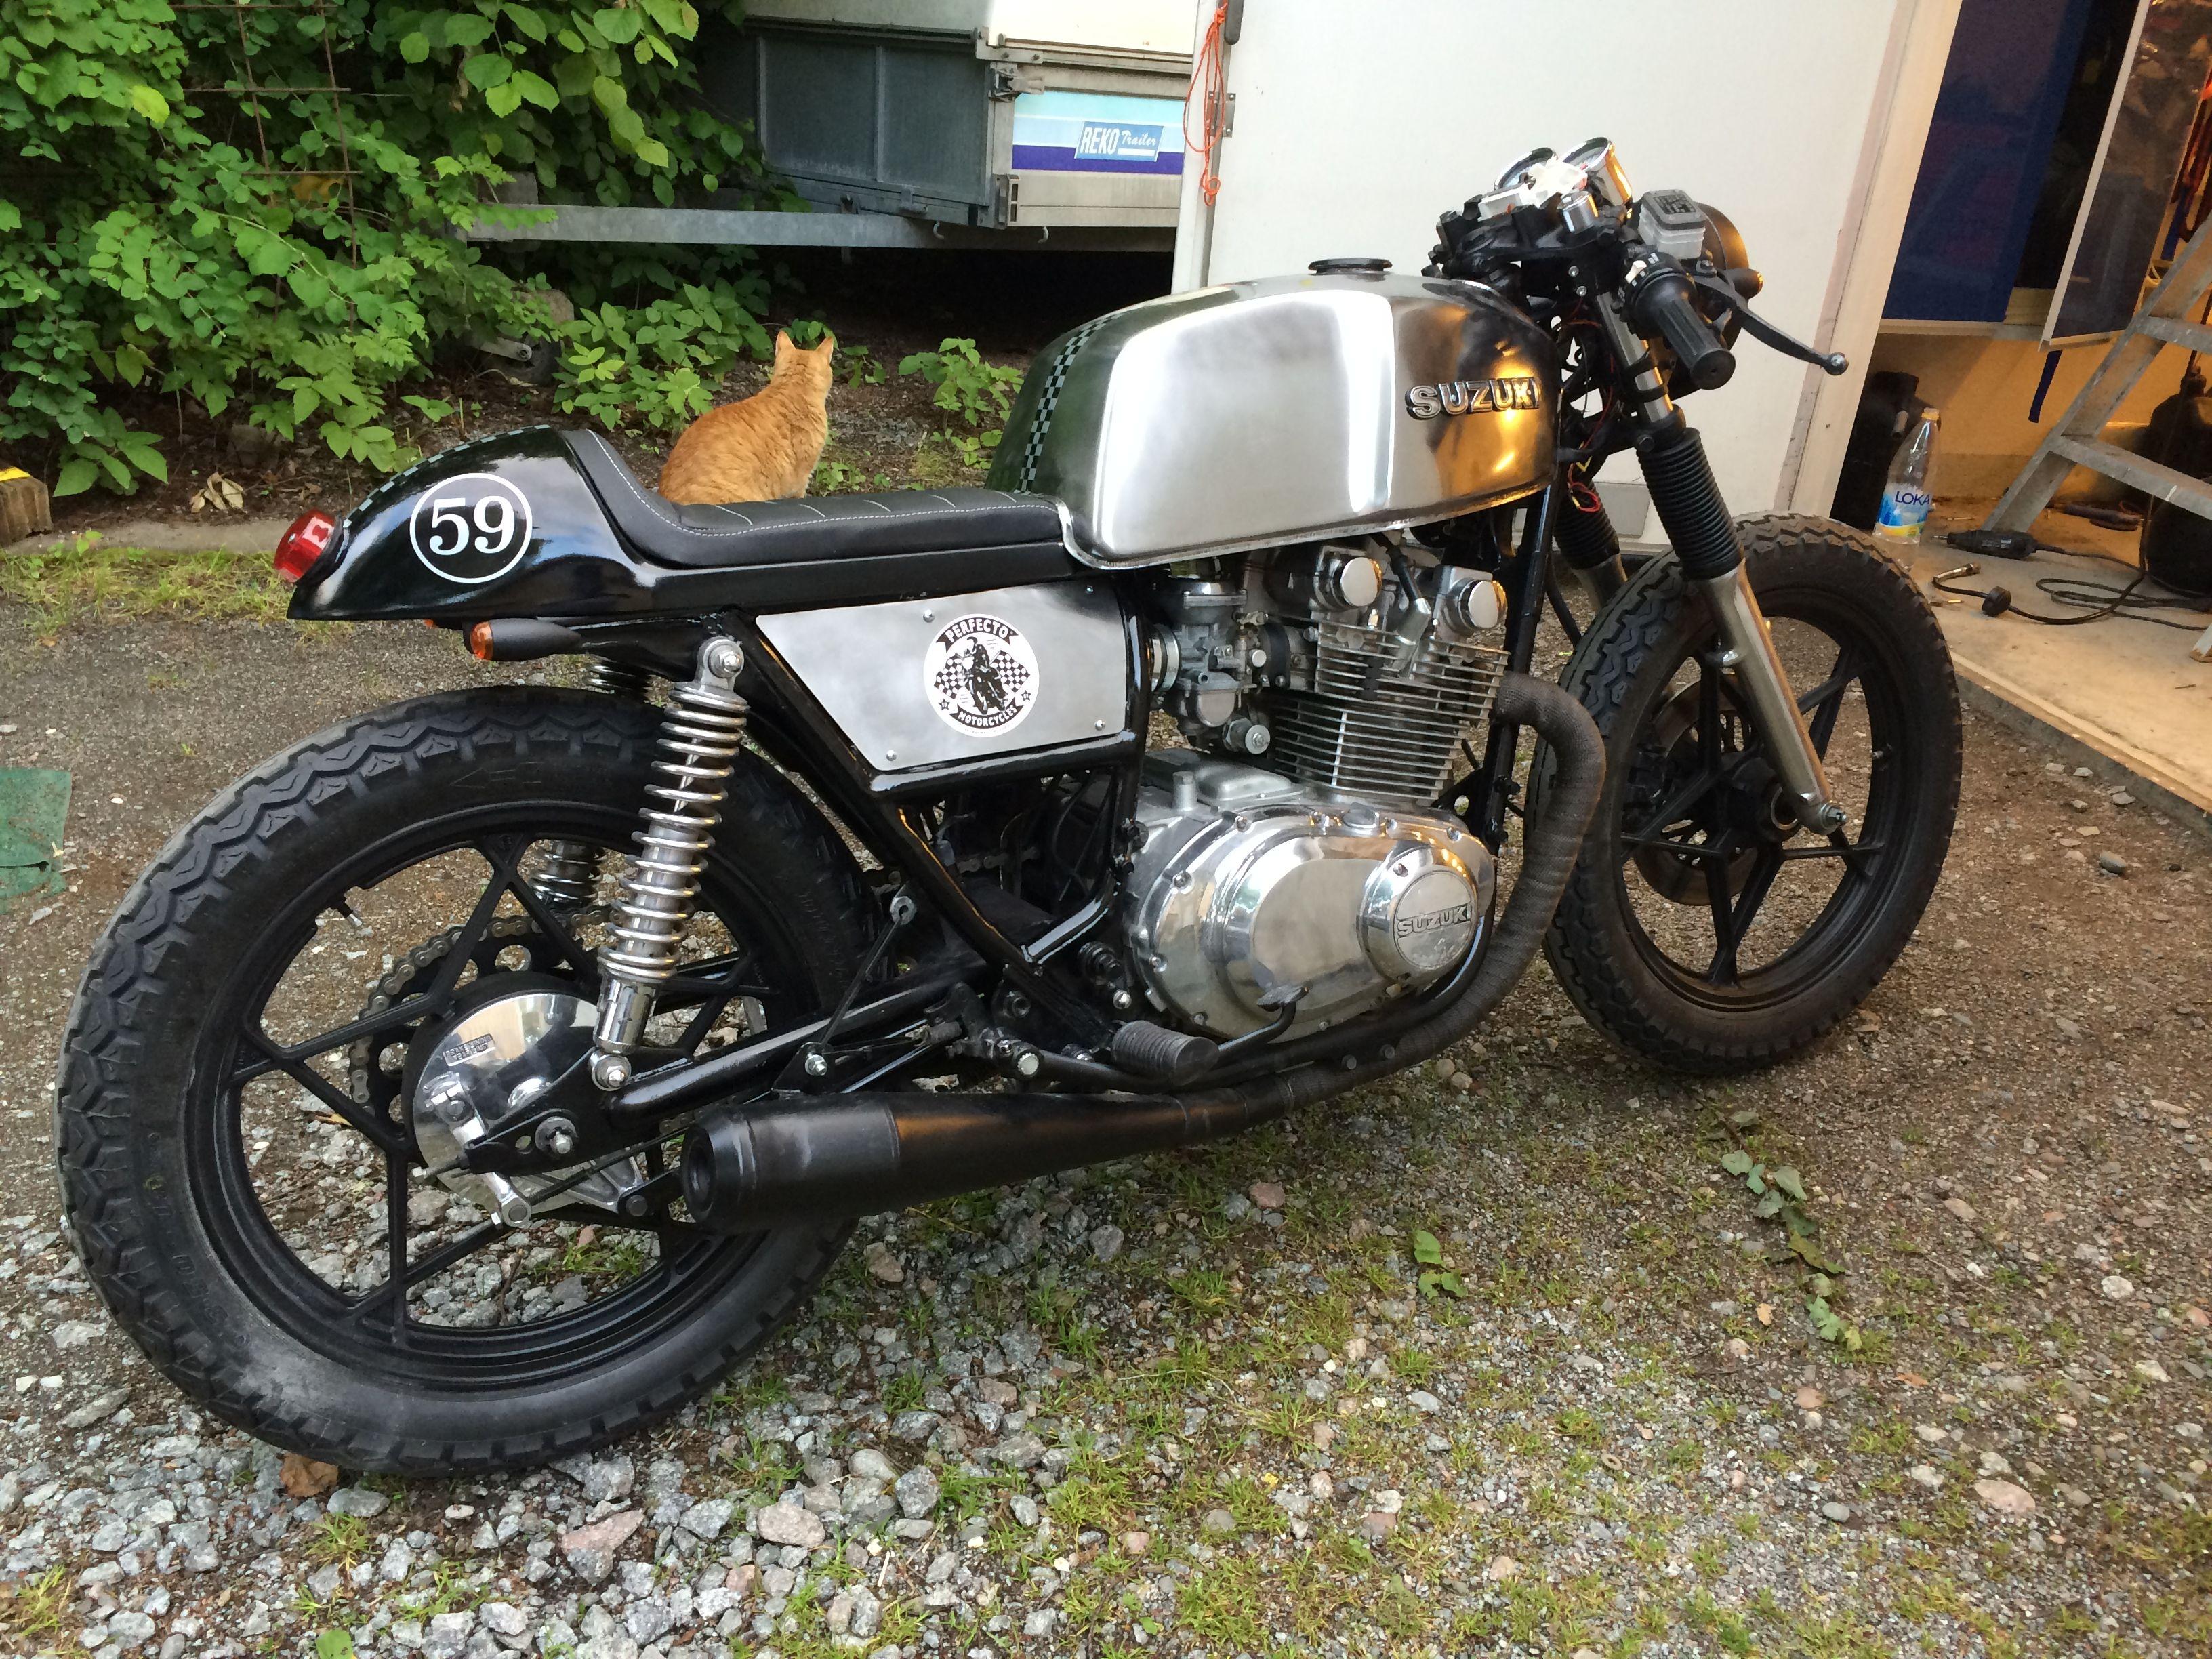 Crossfield Suzuki Gs 450 Cafe Racer Cafe Bike Suzuki Cafe Racer